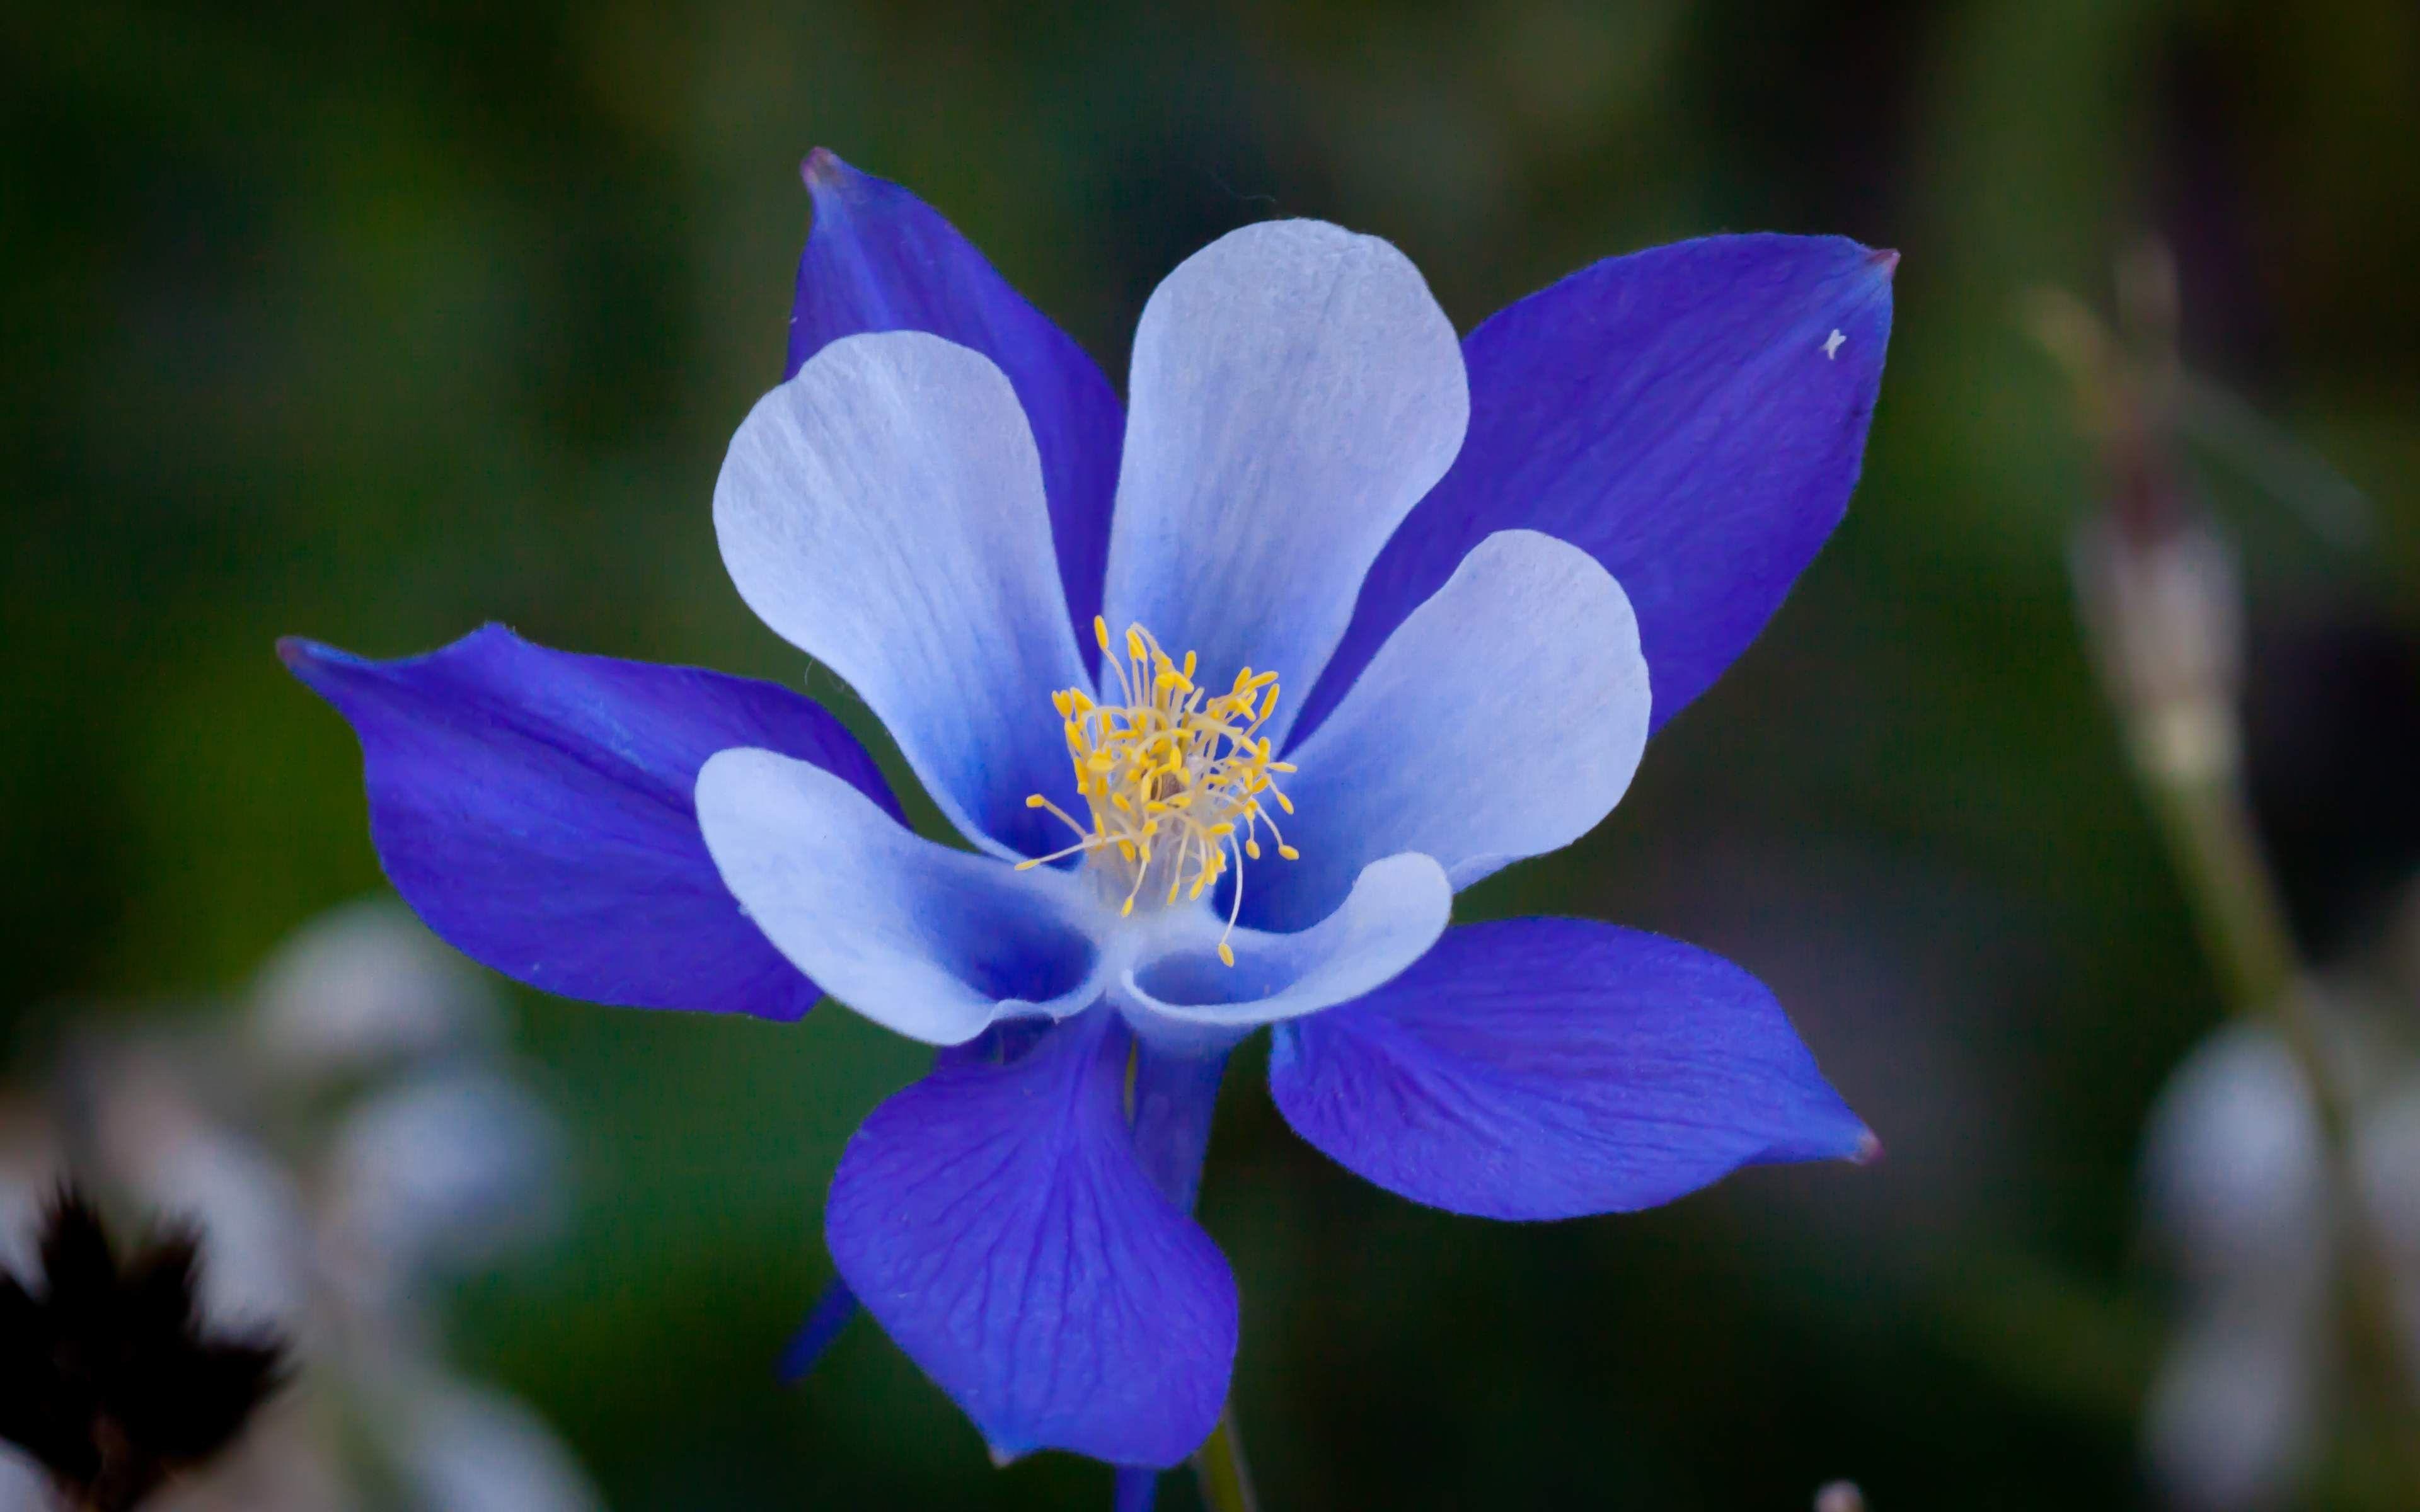 Columbine flower 4k ultra hd wallpaper sharovarka pinterest blue columbine flower state flower of colorado izmirmasajfo Images